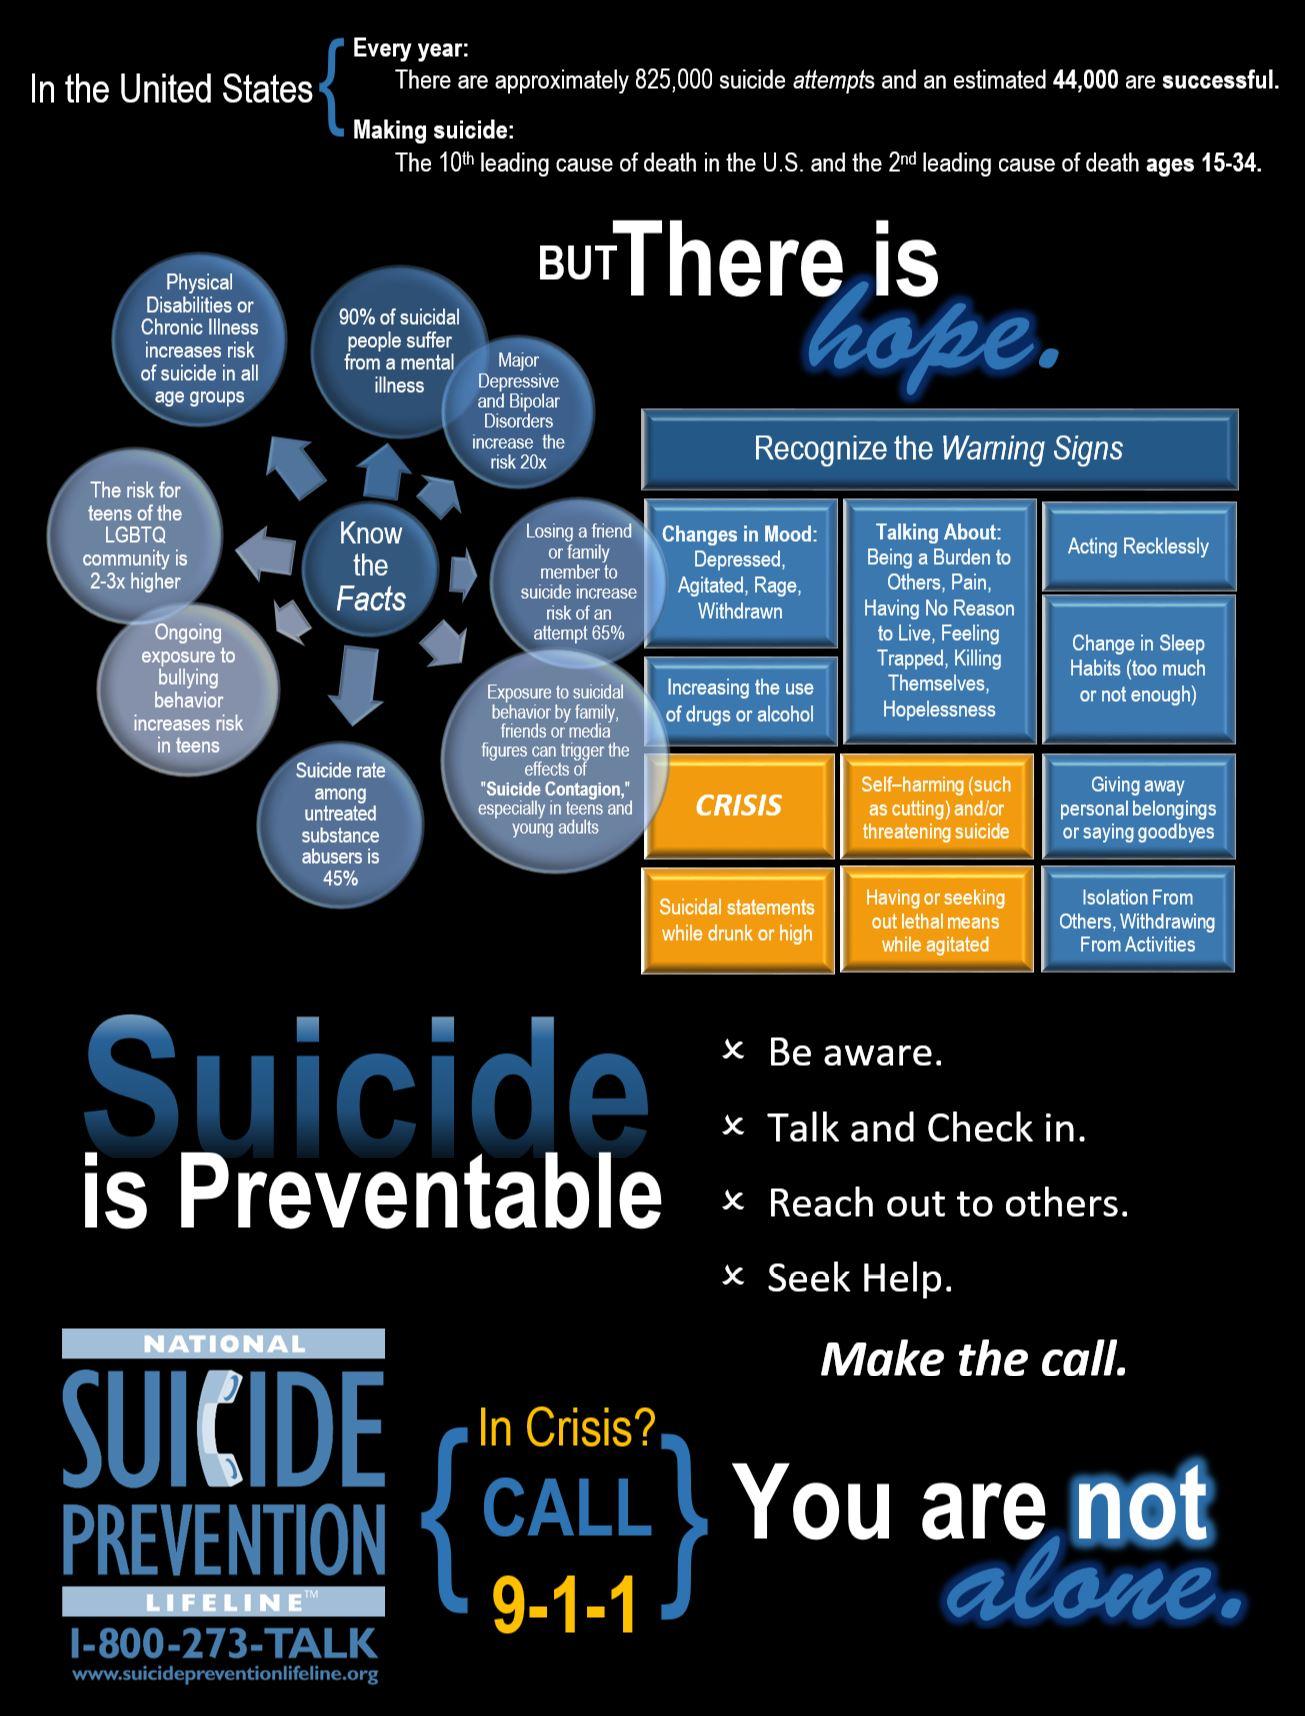 Suicide Prevention Cover Sheet Website.JPG